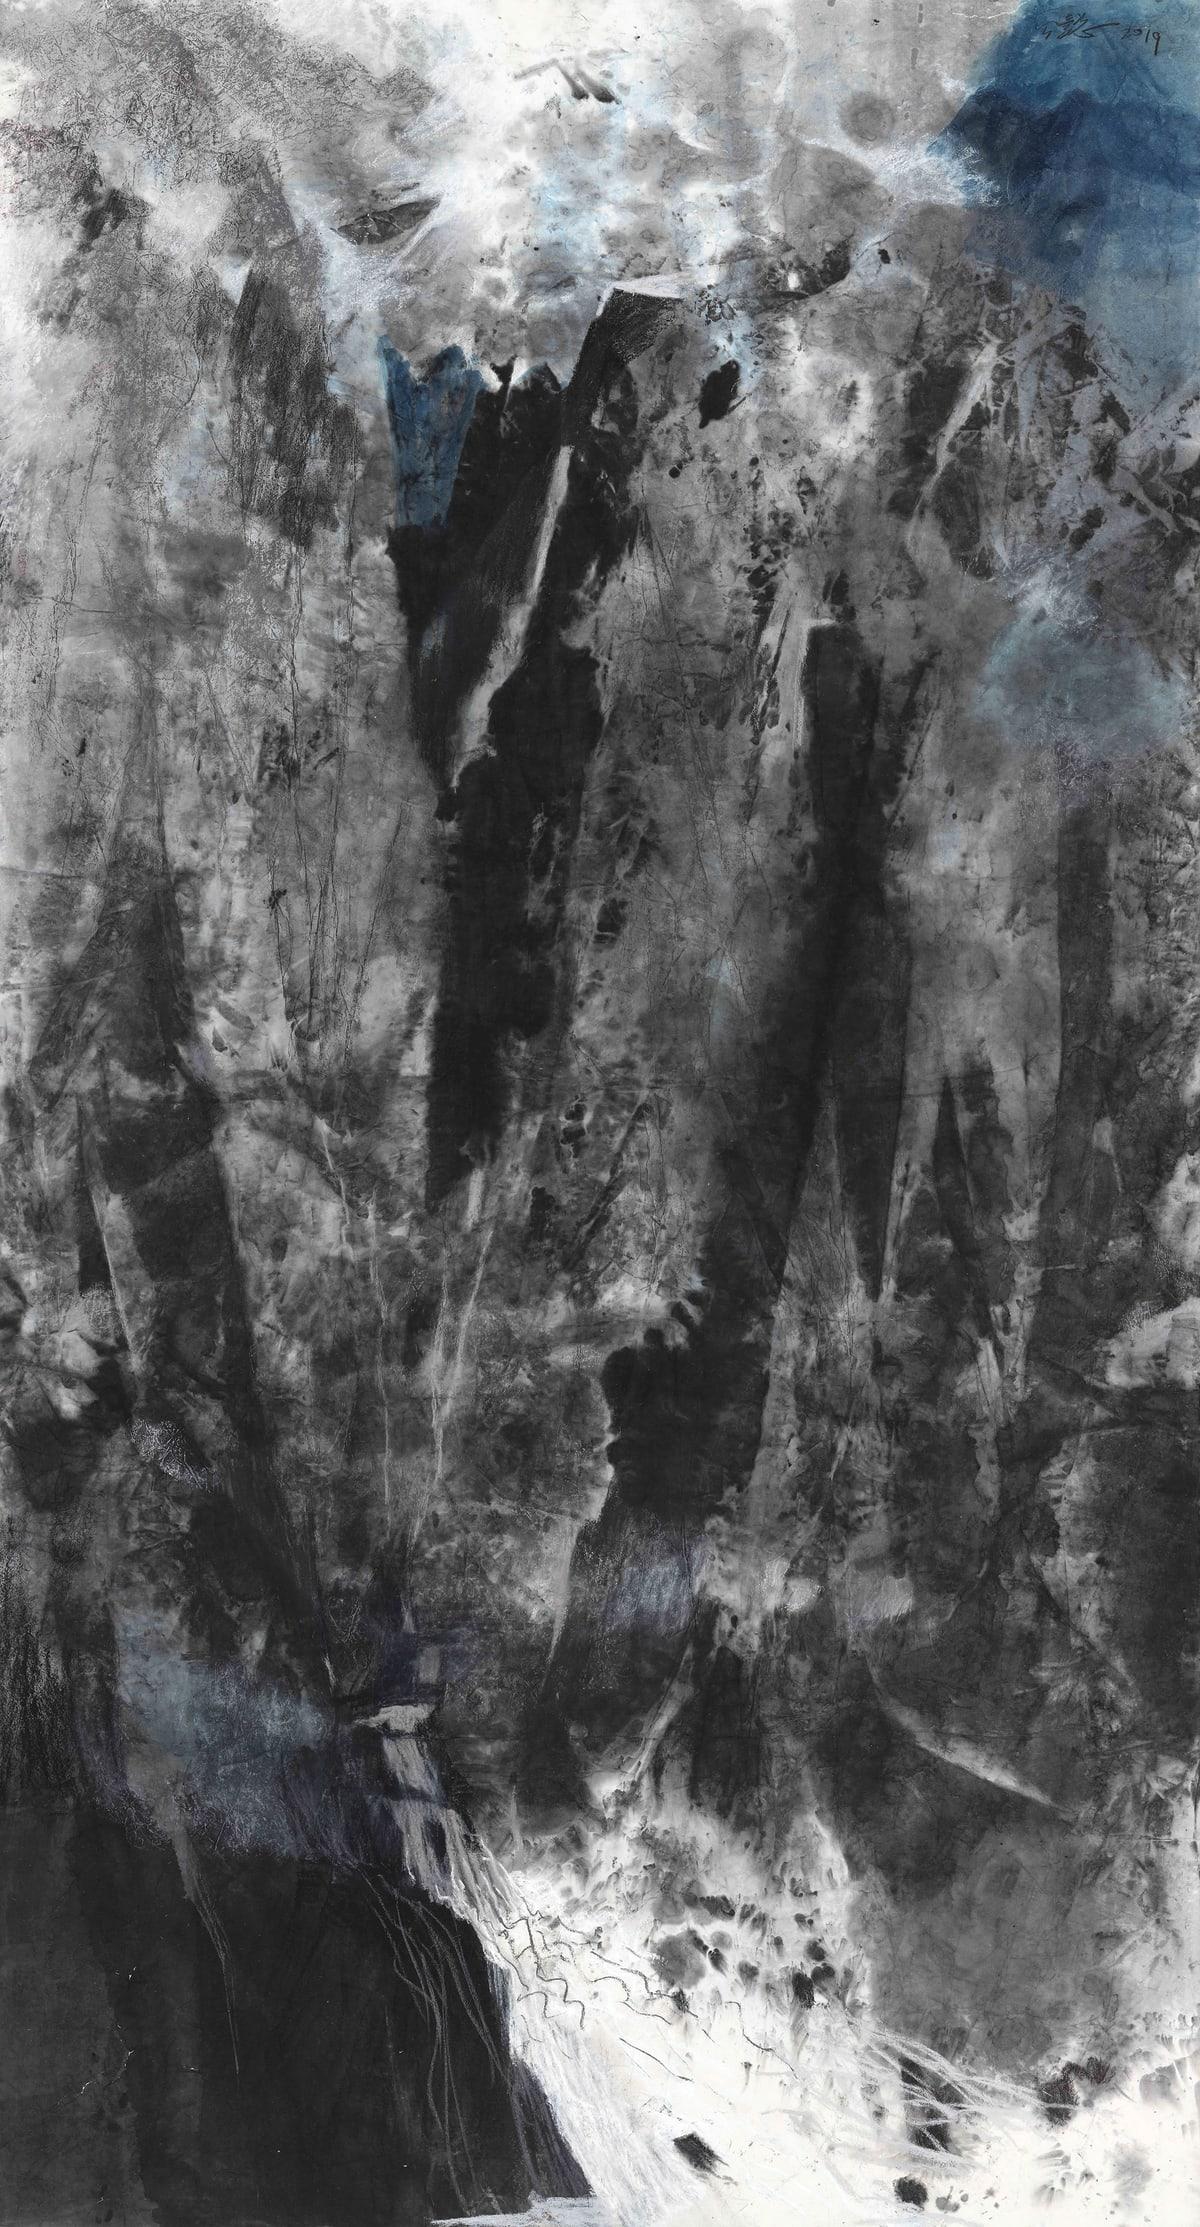 Wang Gongyi 王公懿, Follow the Creek No.2 緣溪行之二, 2019